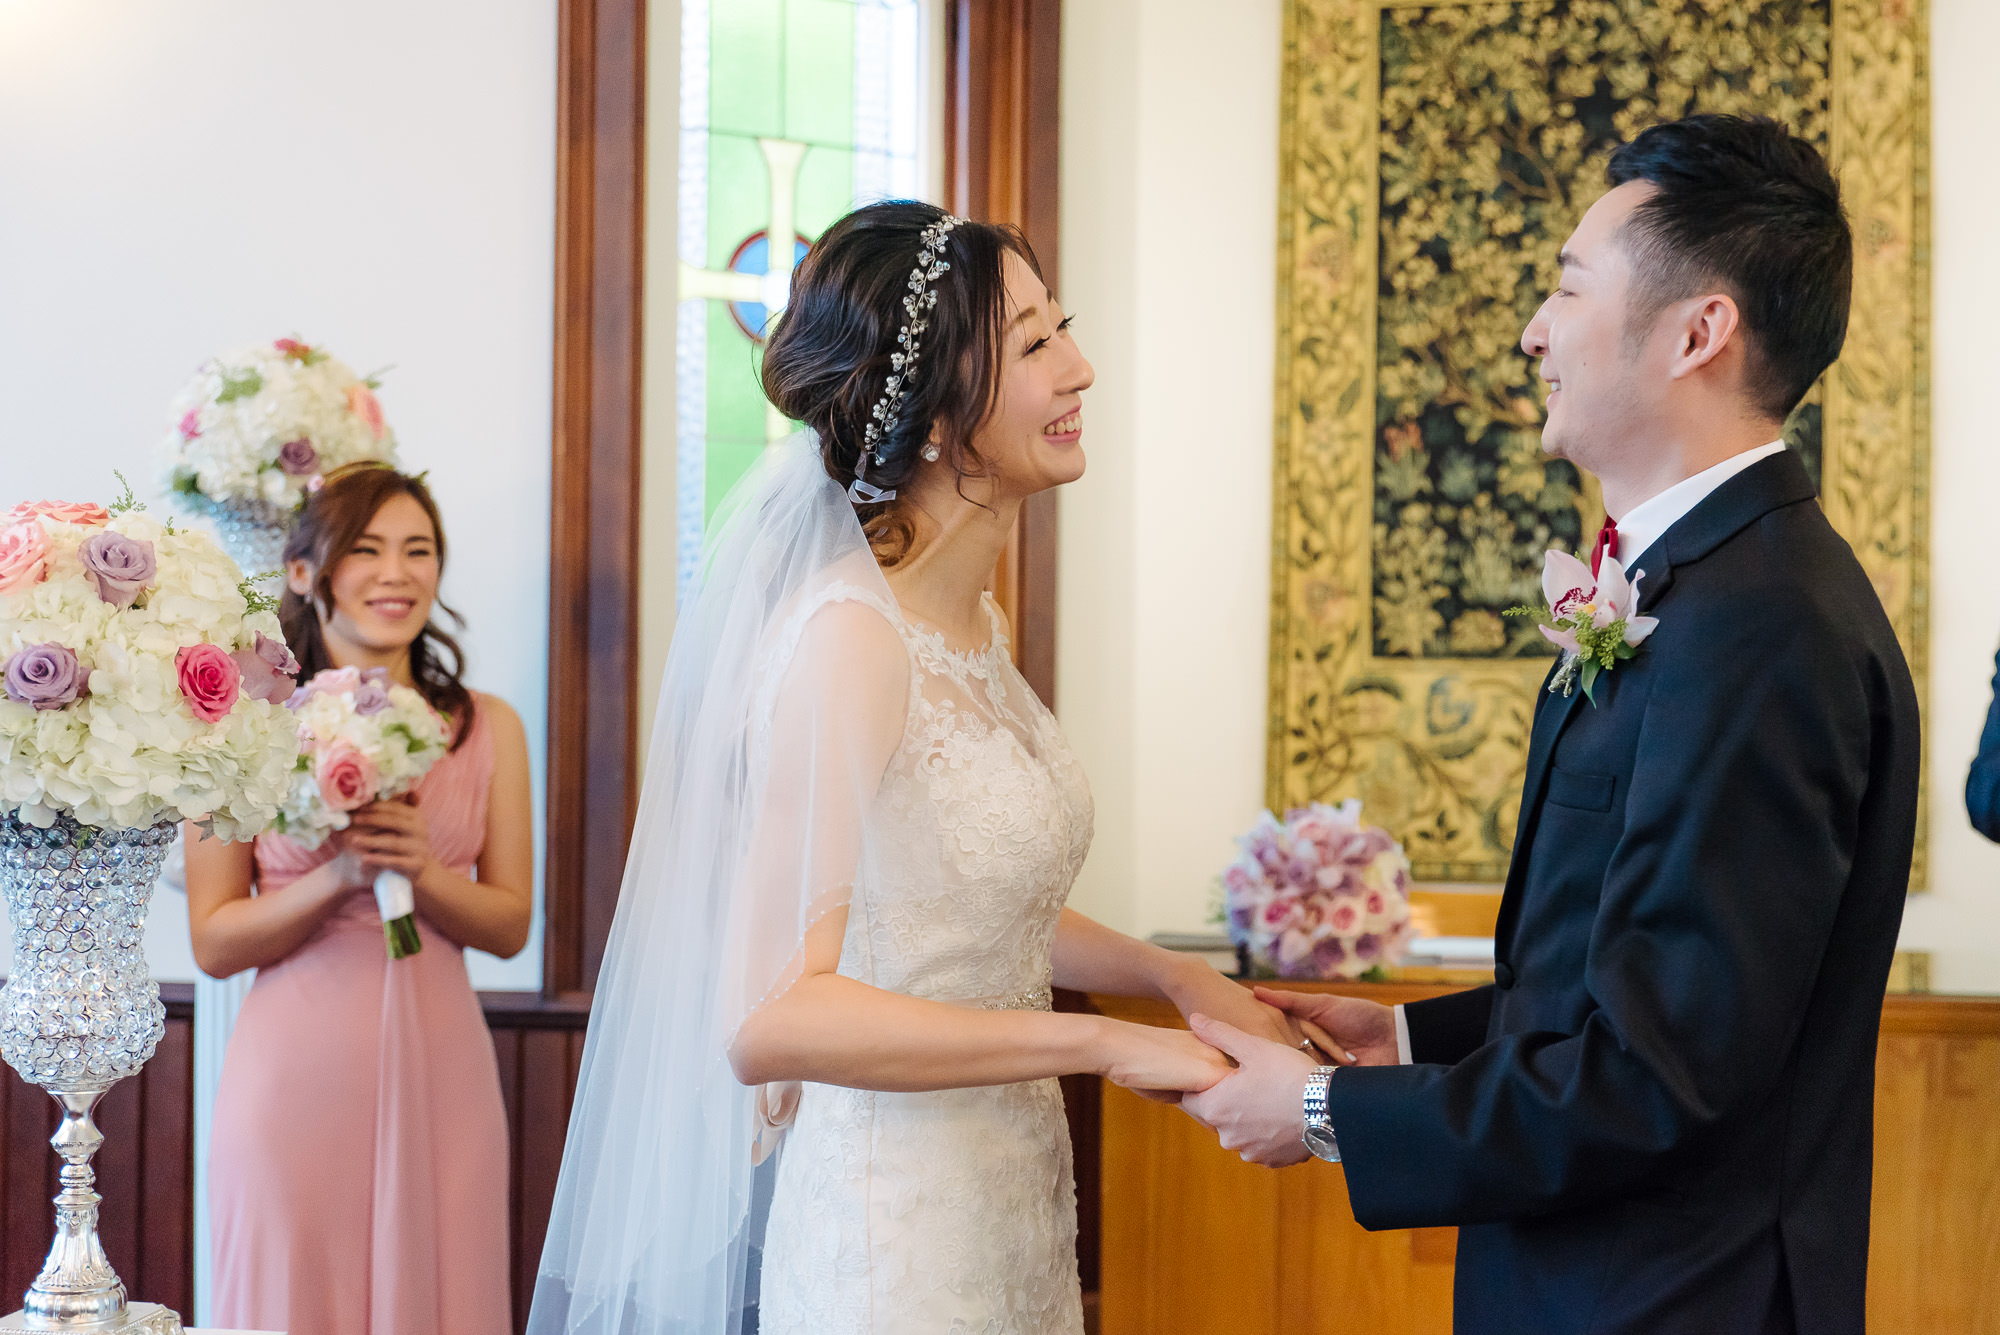 minoru_chapel_richmond_wedding_ceremony 16211312.jpg